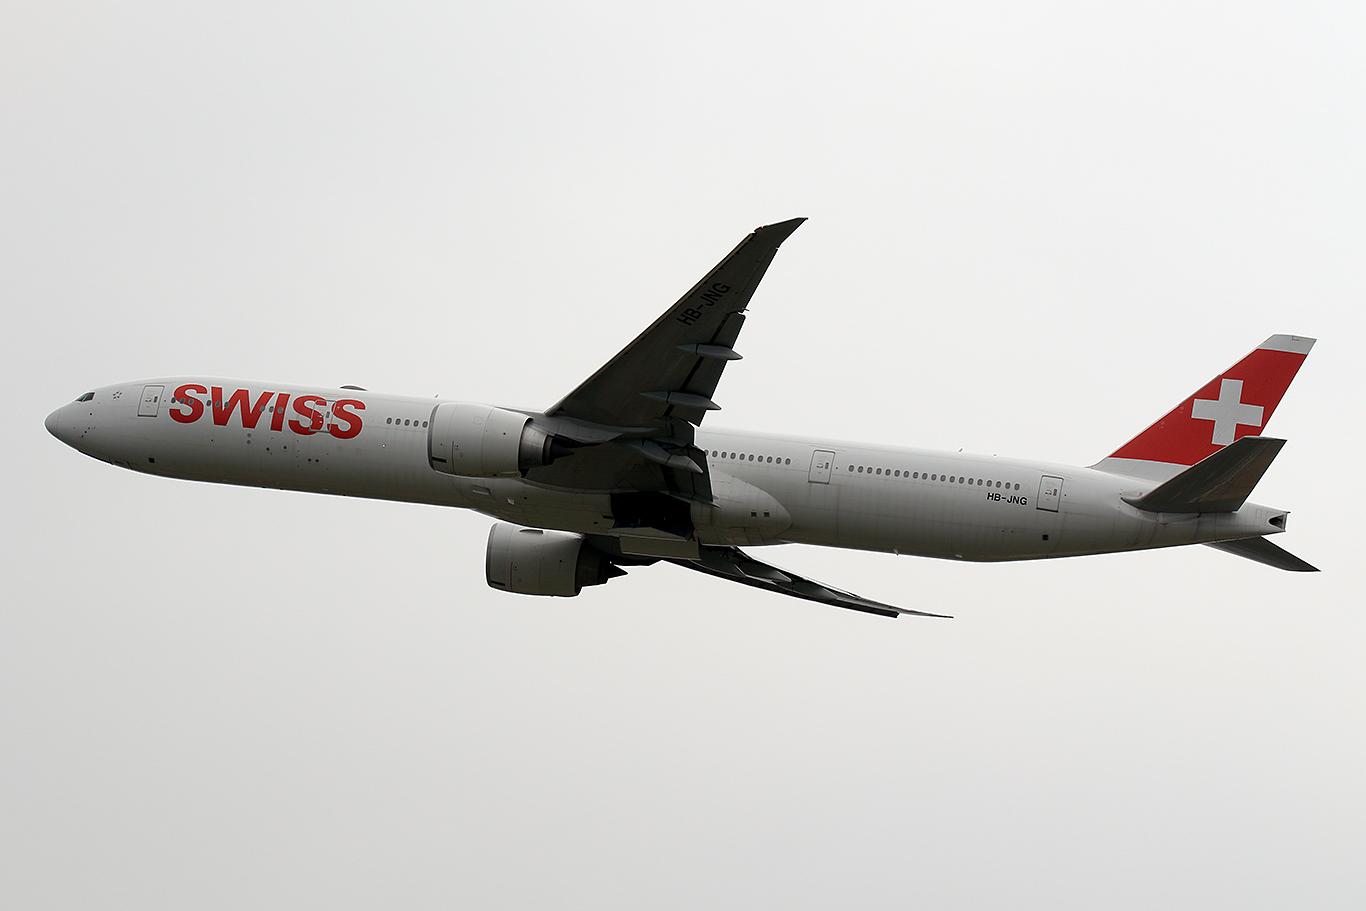 LX/SWR/スイス国際航空 LX161 B777-300ER HB-JNG